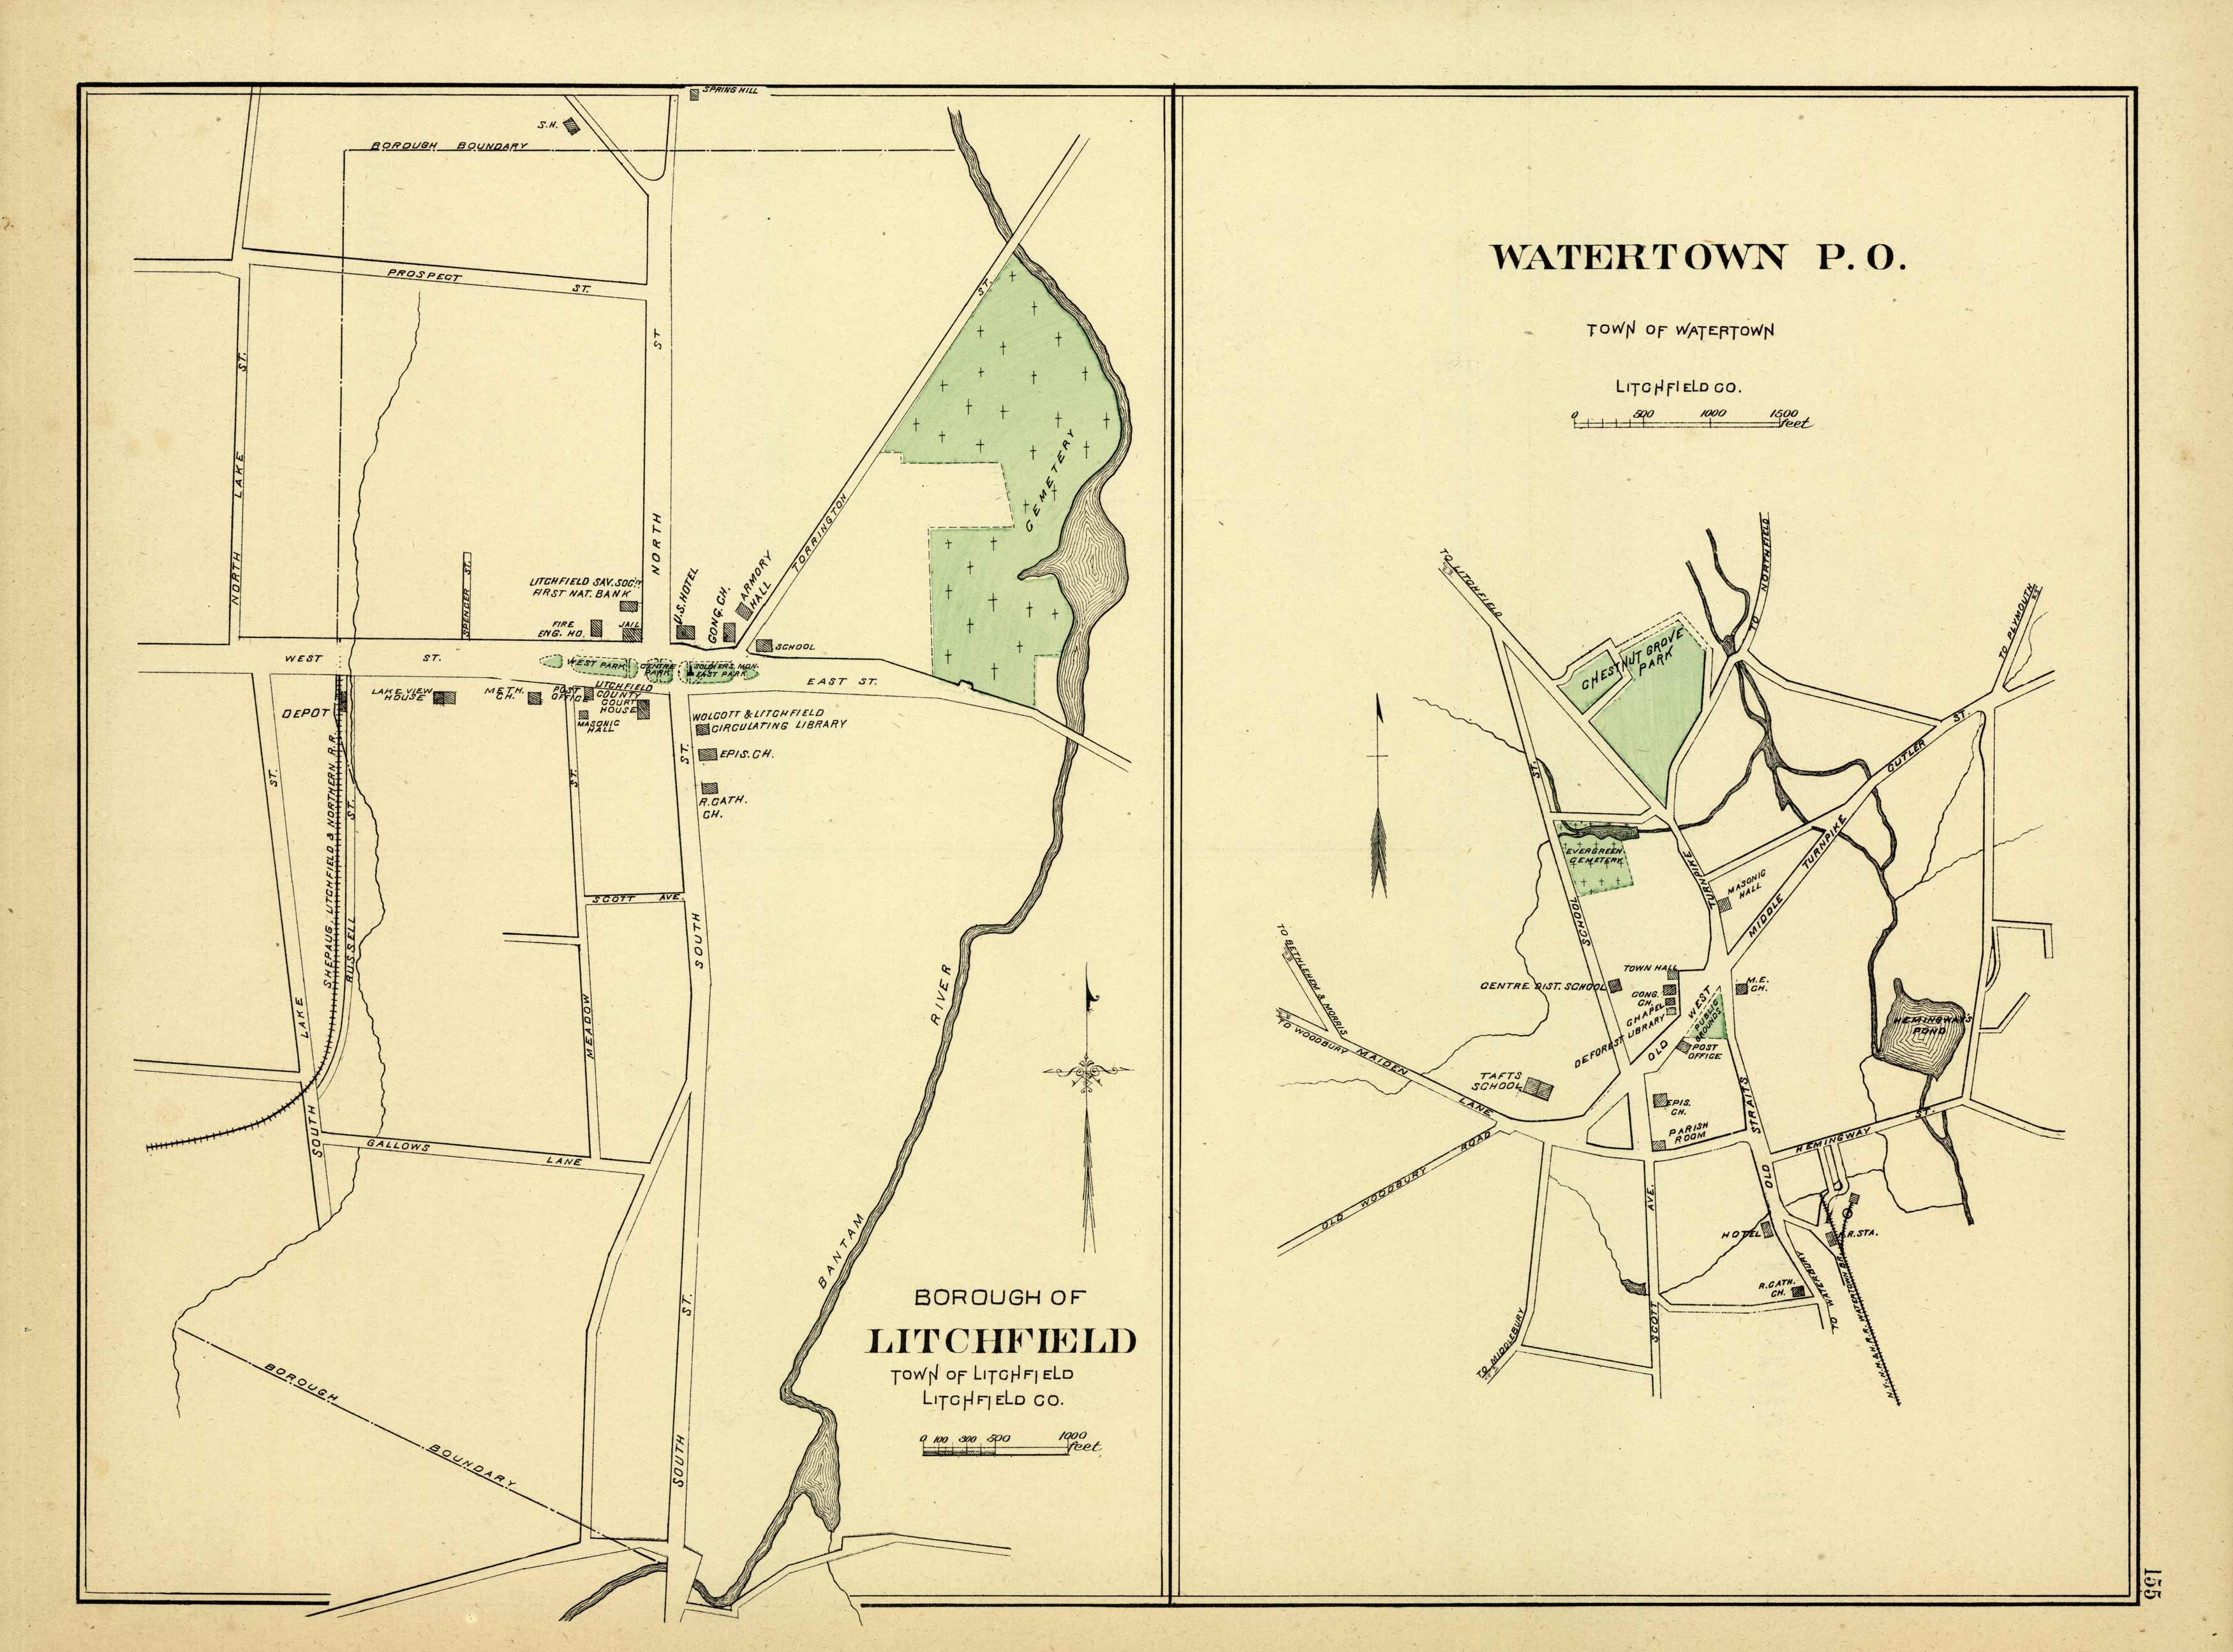 Borough of Litchfield Town of Litchfield, Watertown P.O. Town of Watertown  Litchfield County